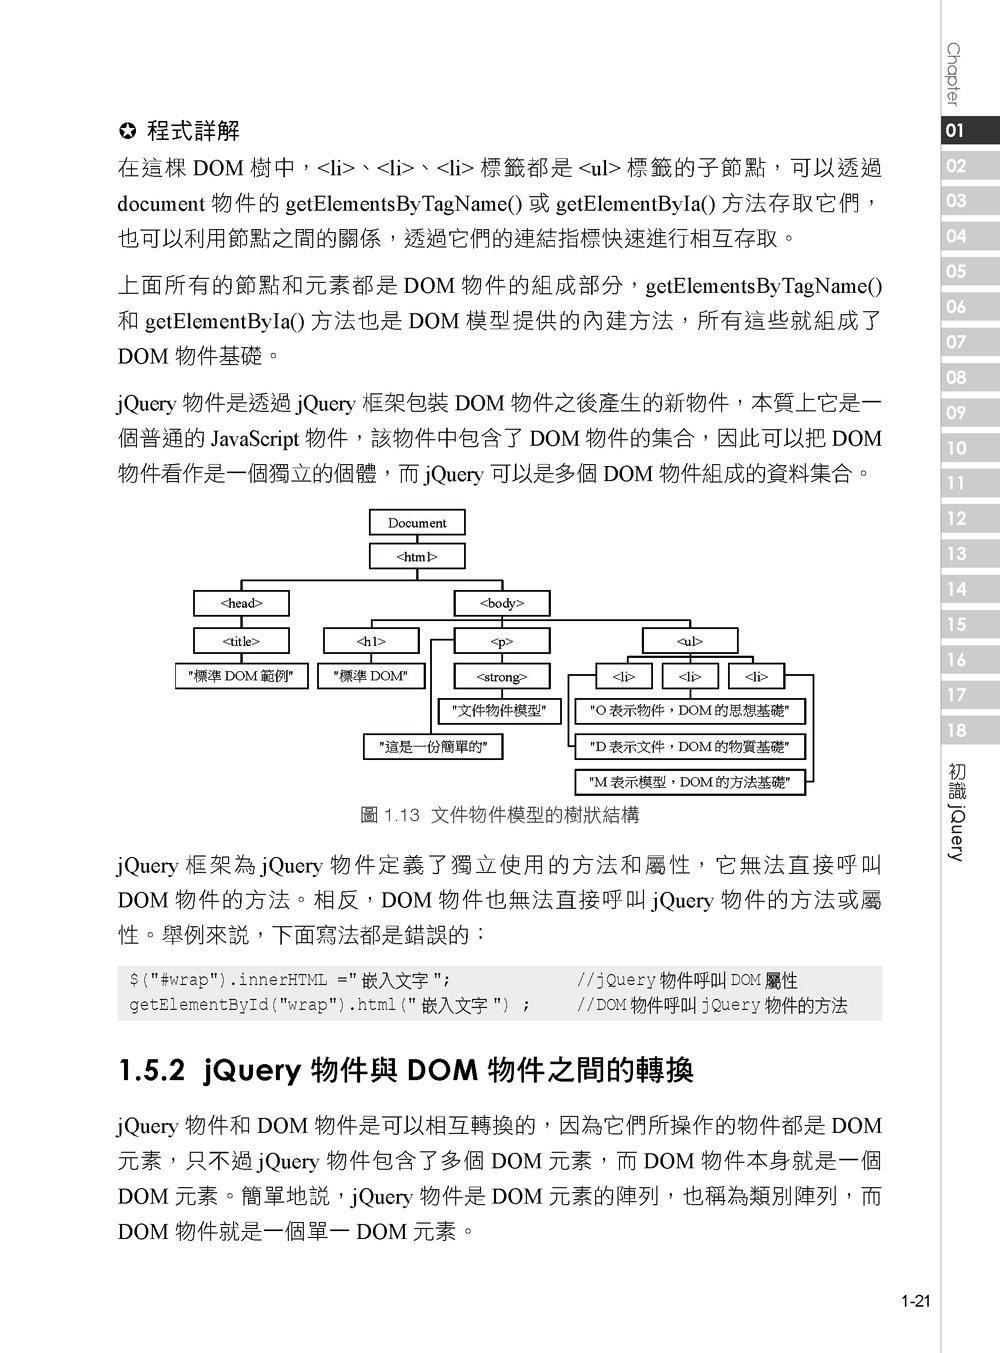 JQuery 從入門到實戰之路 (舊名: 王者歸來 : jQuery開發權威指南)-preview-10